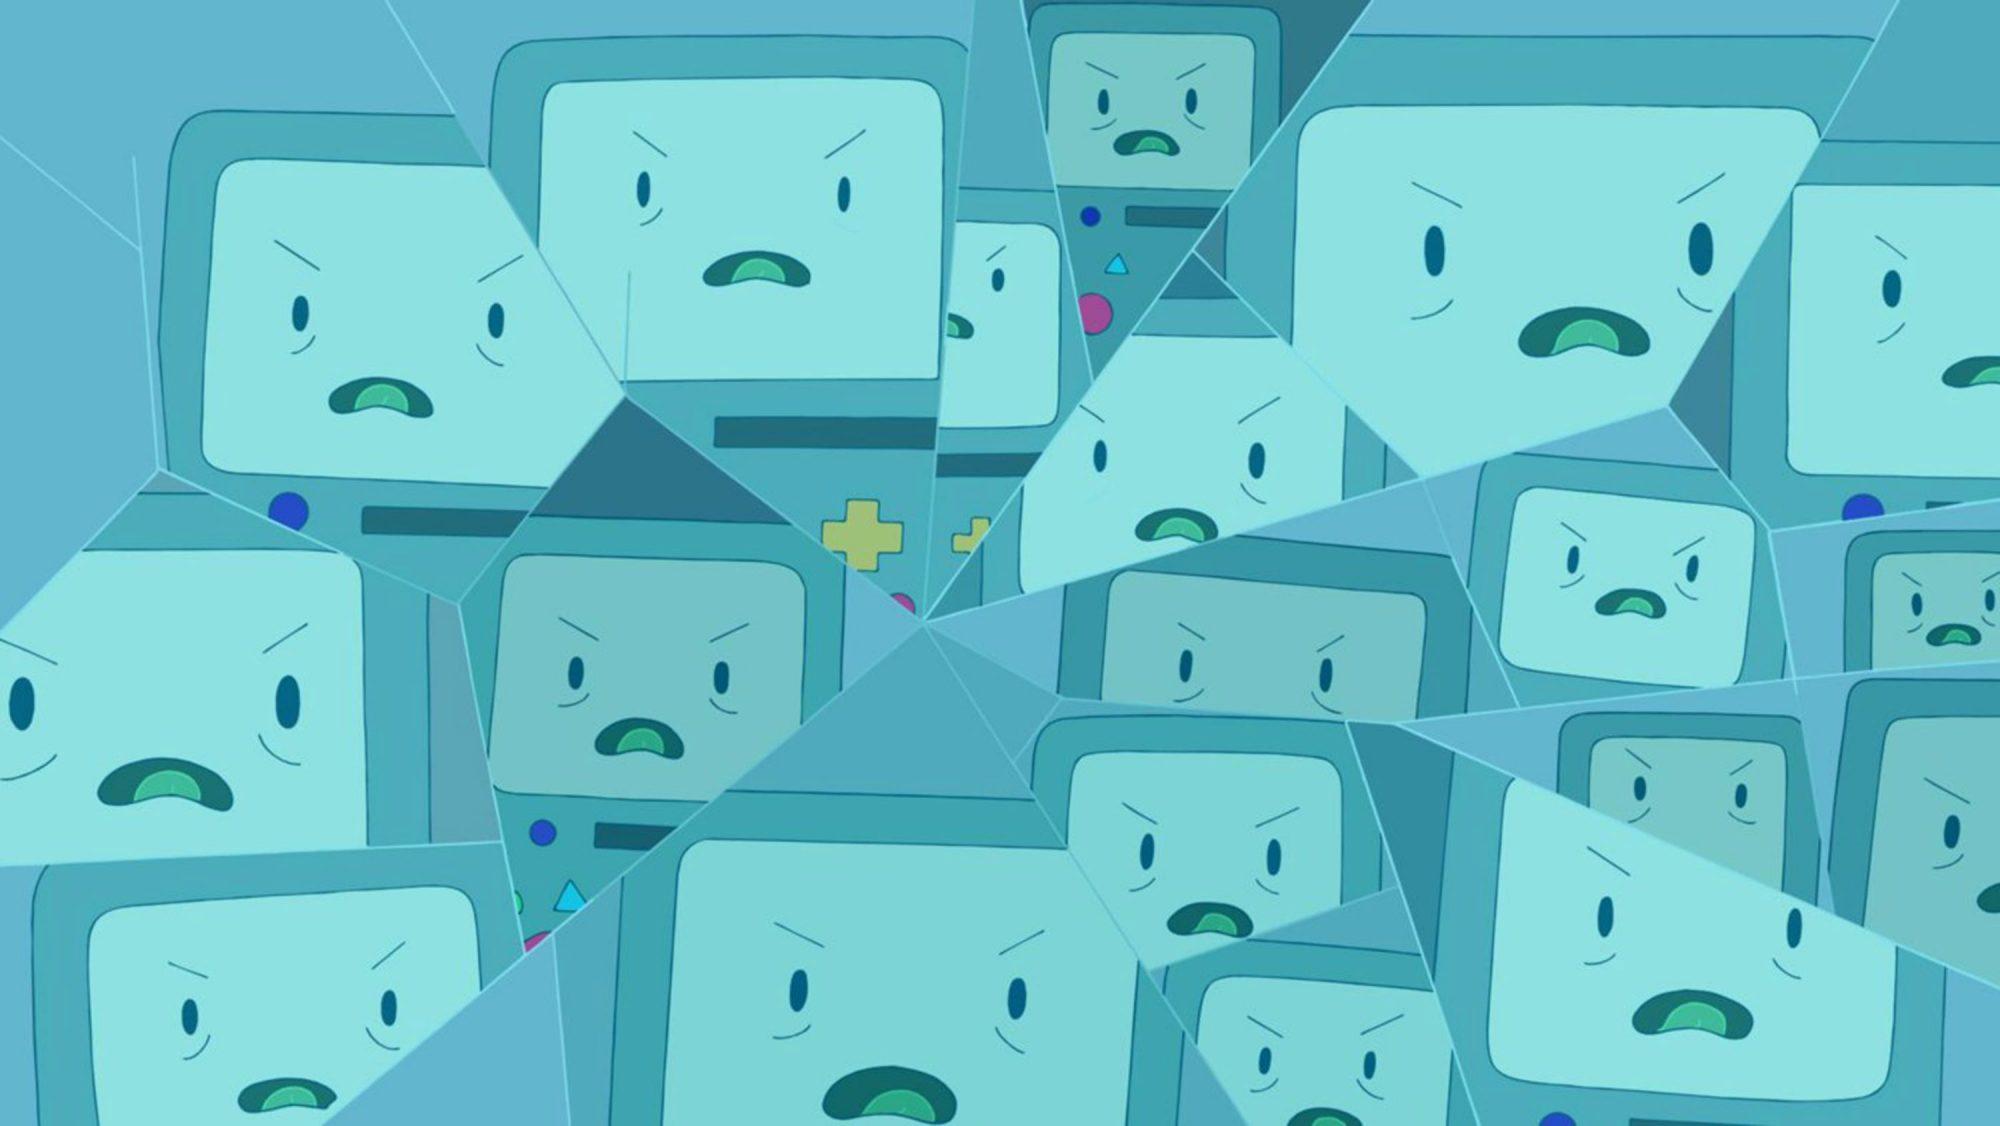 Adventure TimeSeason 7, Episode 5FootballCredit: Cartoon Network